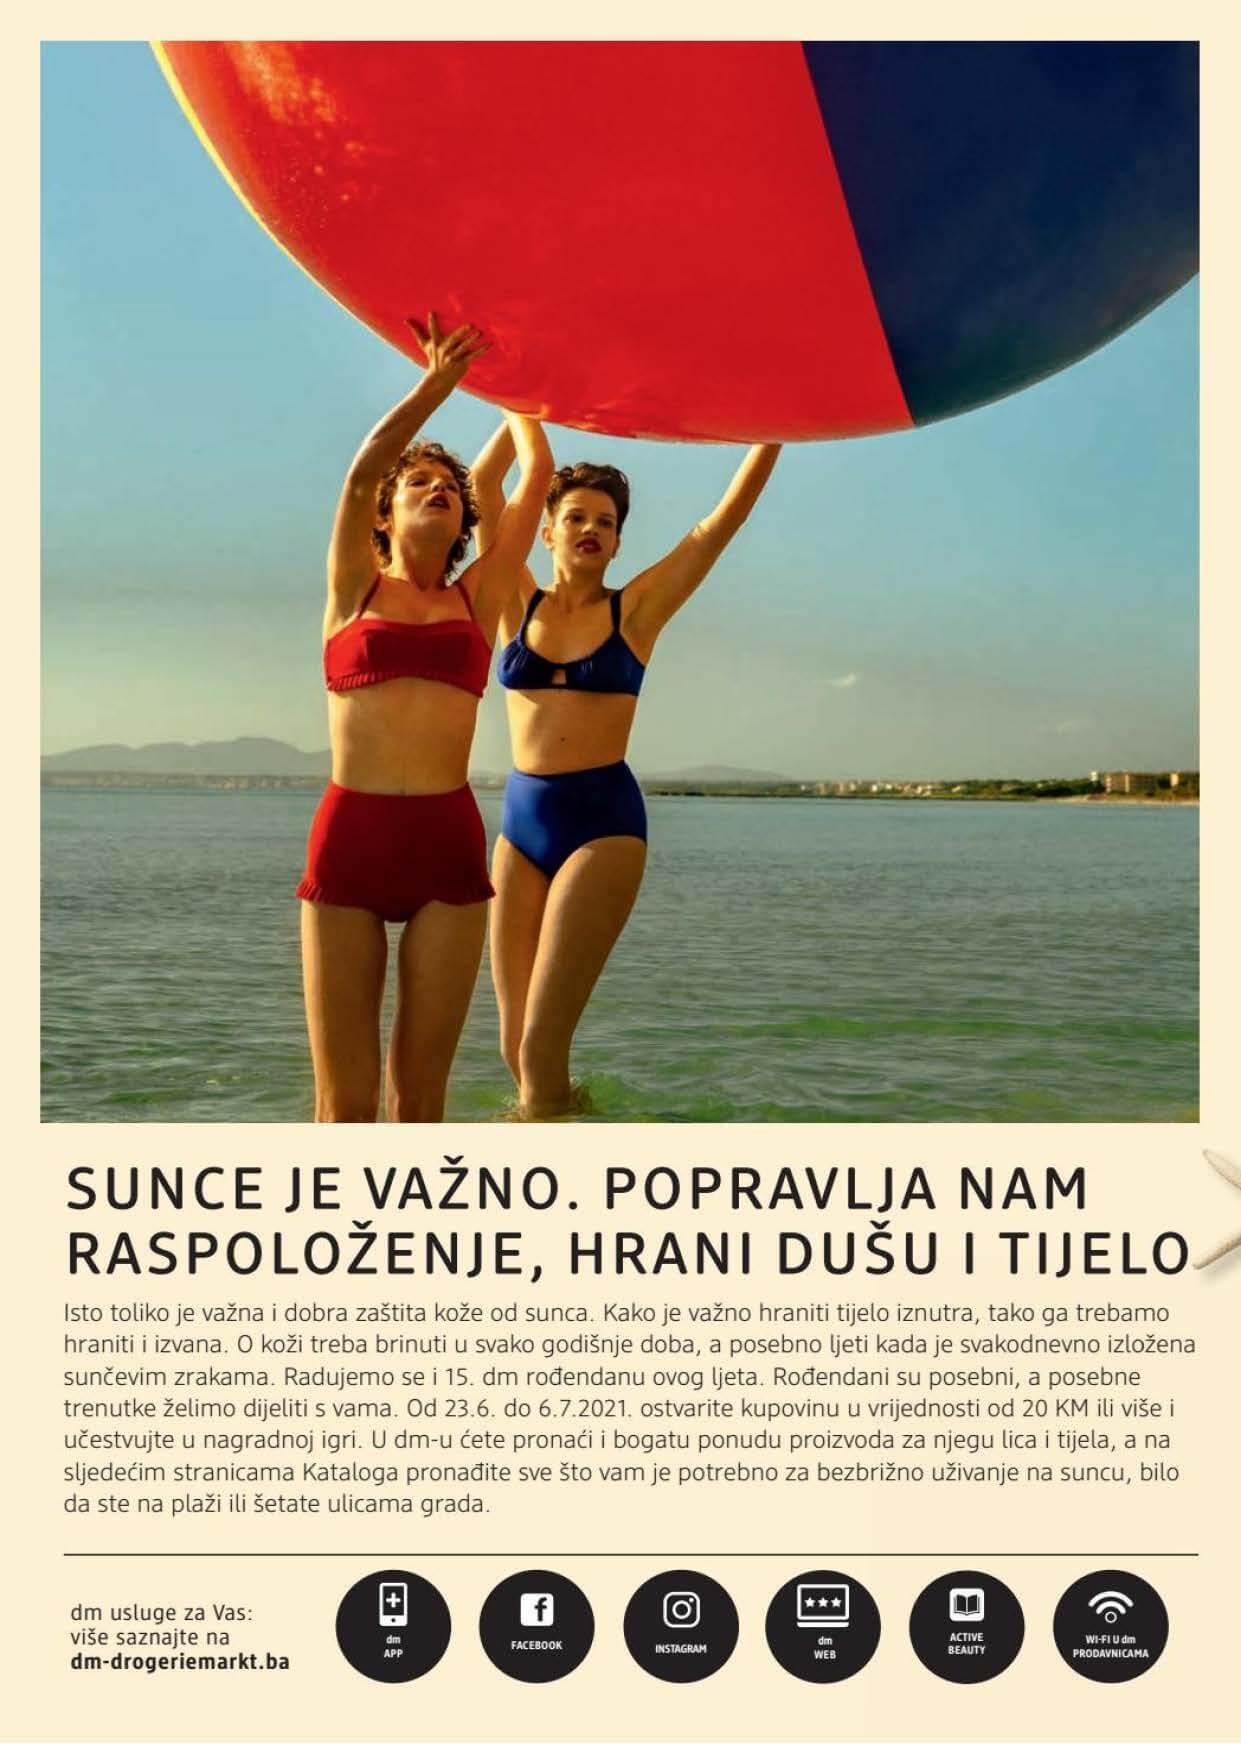 DM Katalog BiH JUN JUL 2021 23.6.2021. 6.7.2021. eKatalozi.com PR Page 02